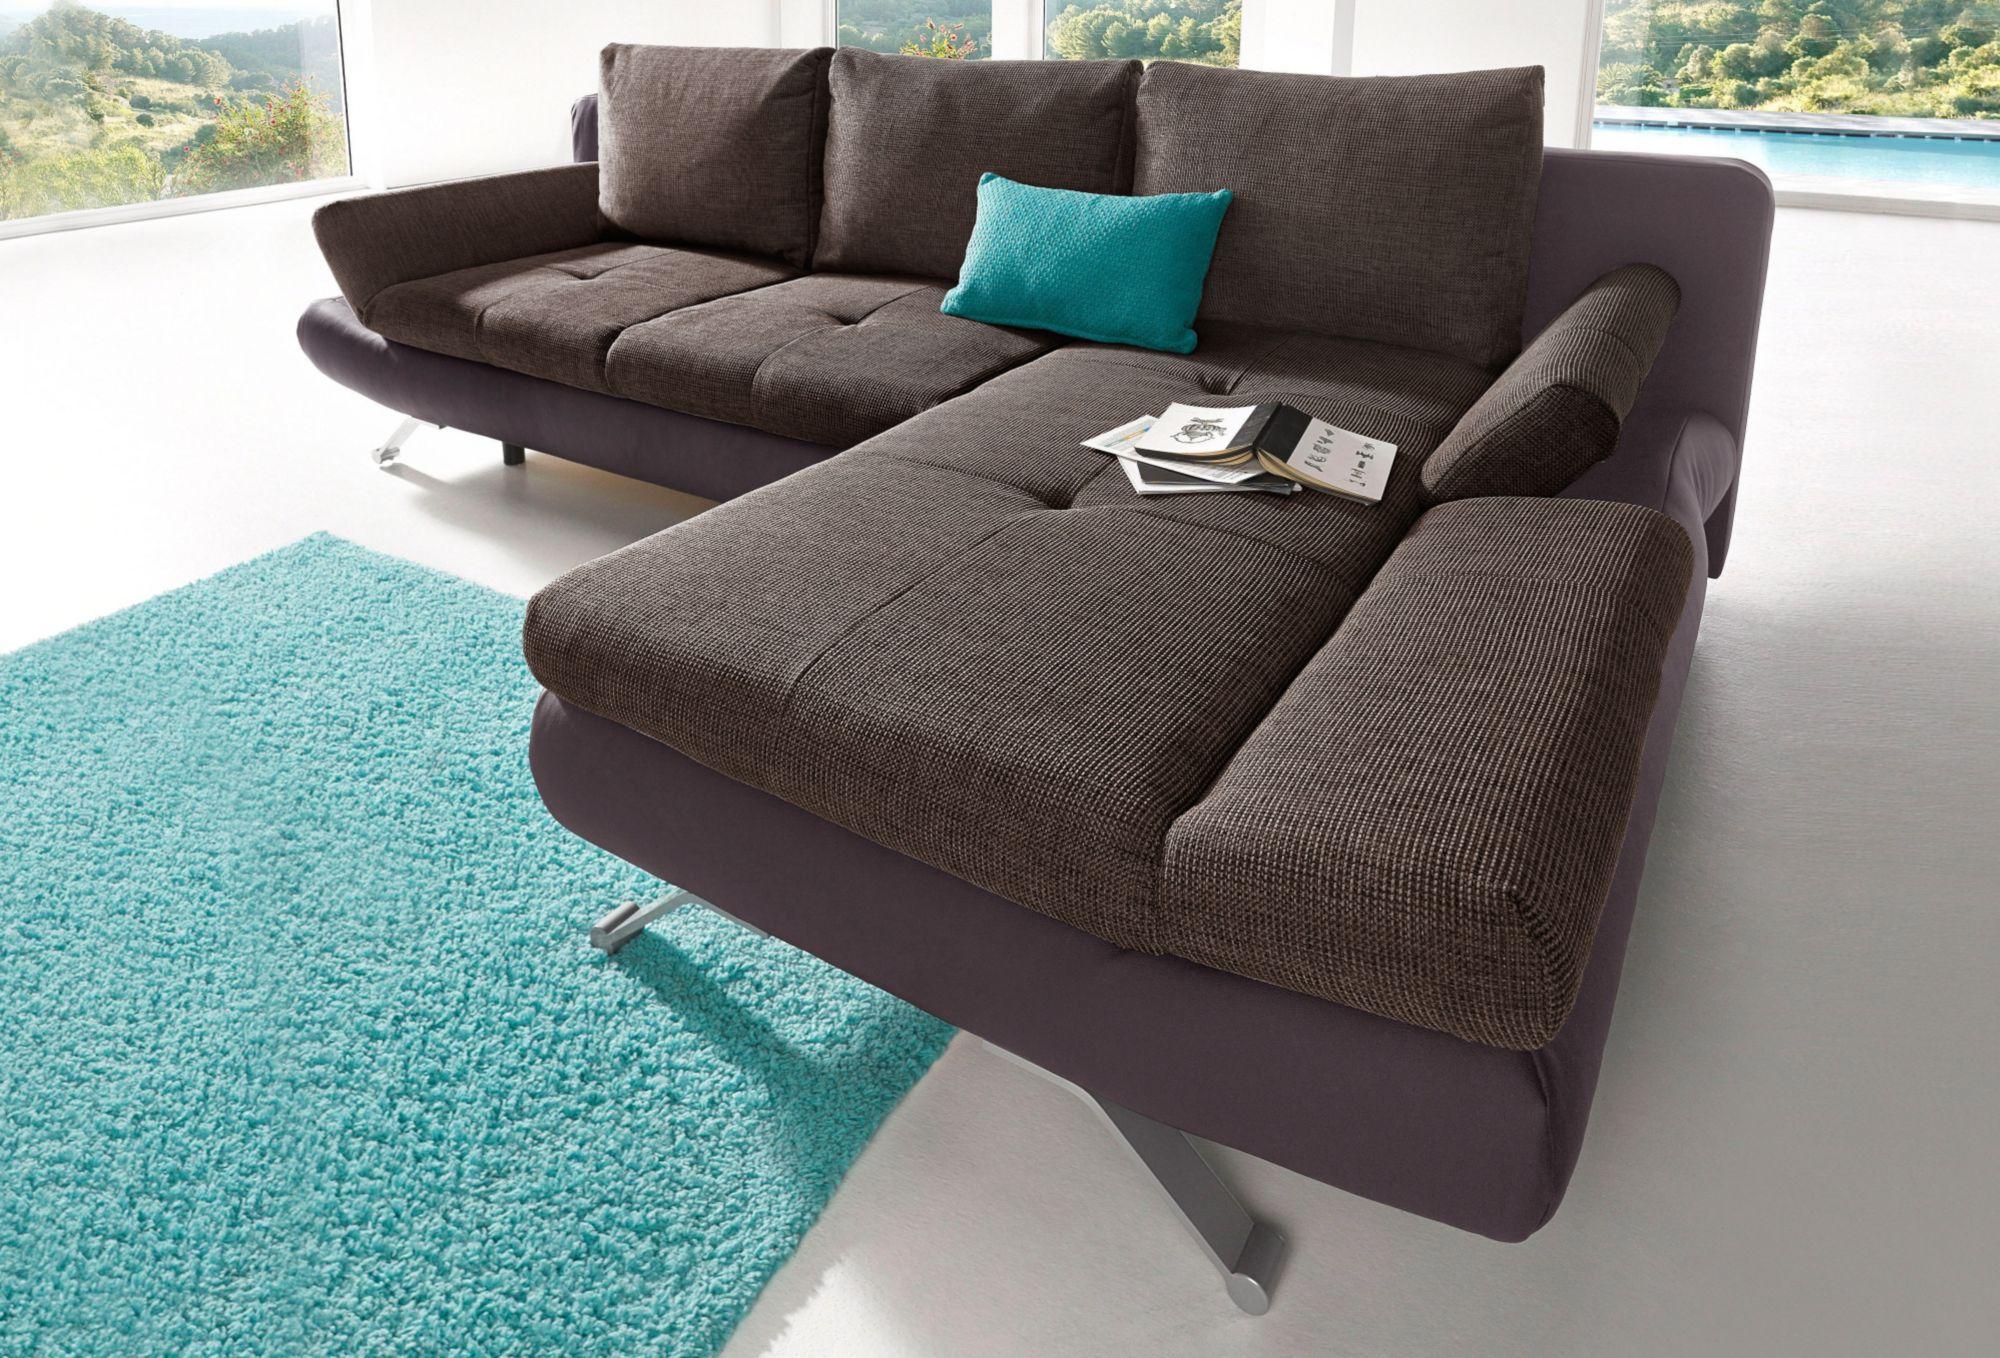 polsterecke sit more mit bettfunktion schwab versand ecksofas. Black Bedroom Furniture Sets. Home Design Ideas